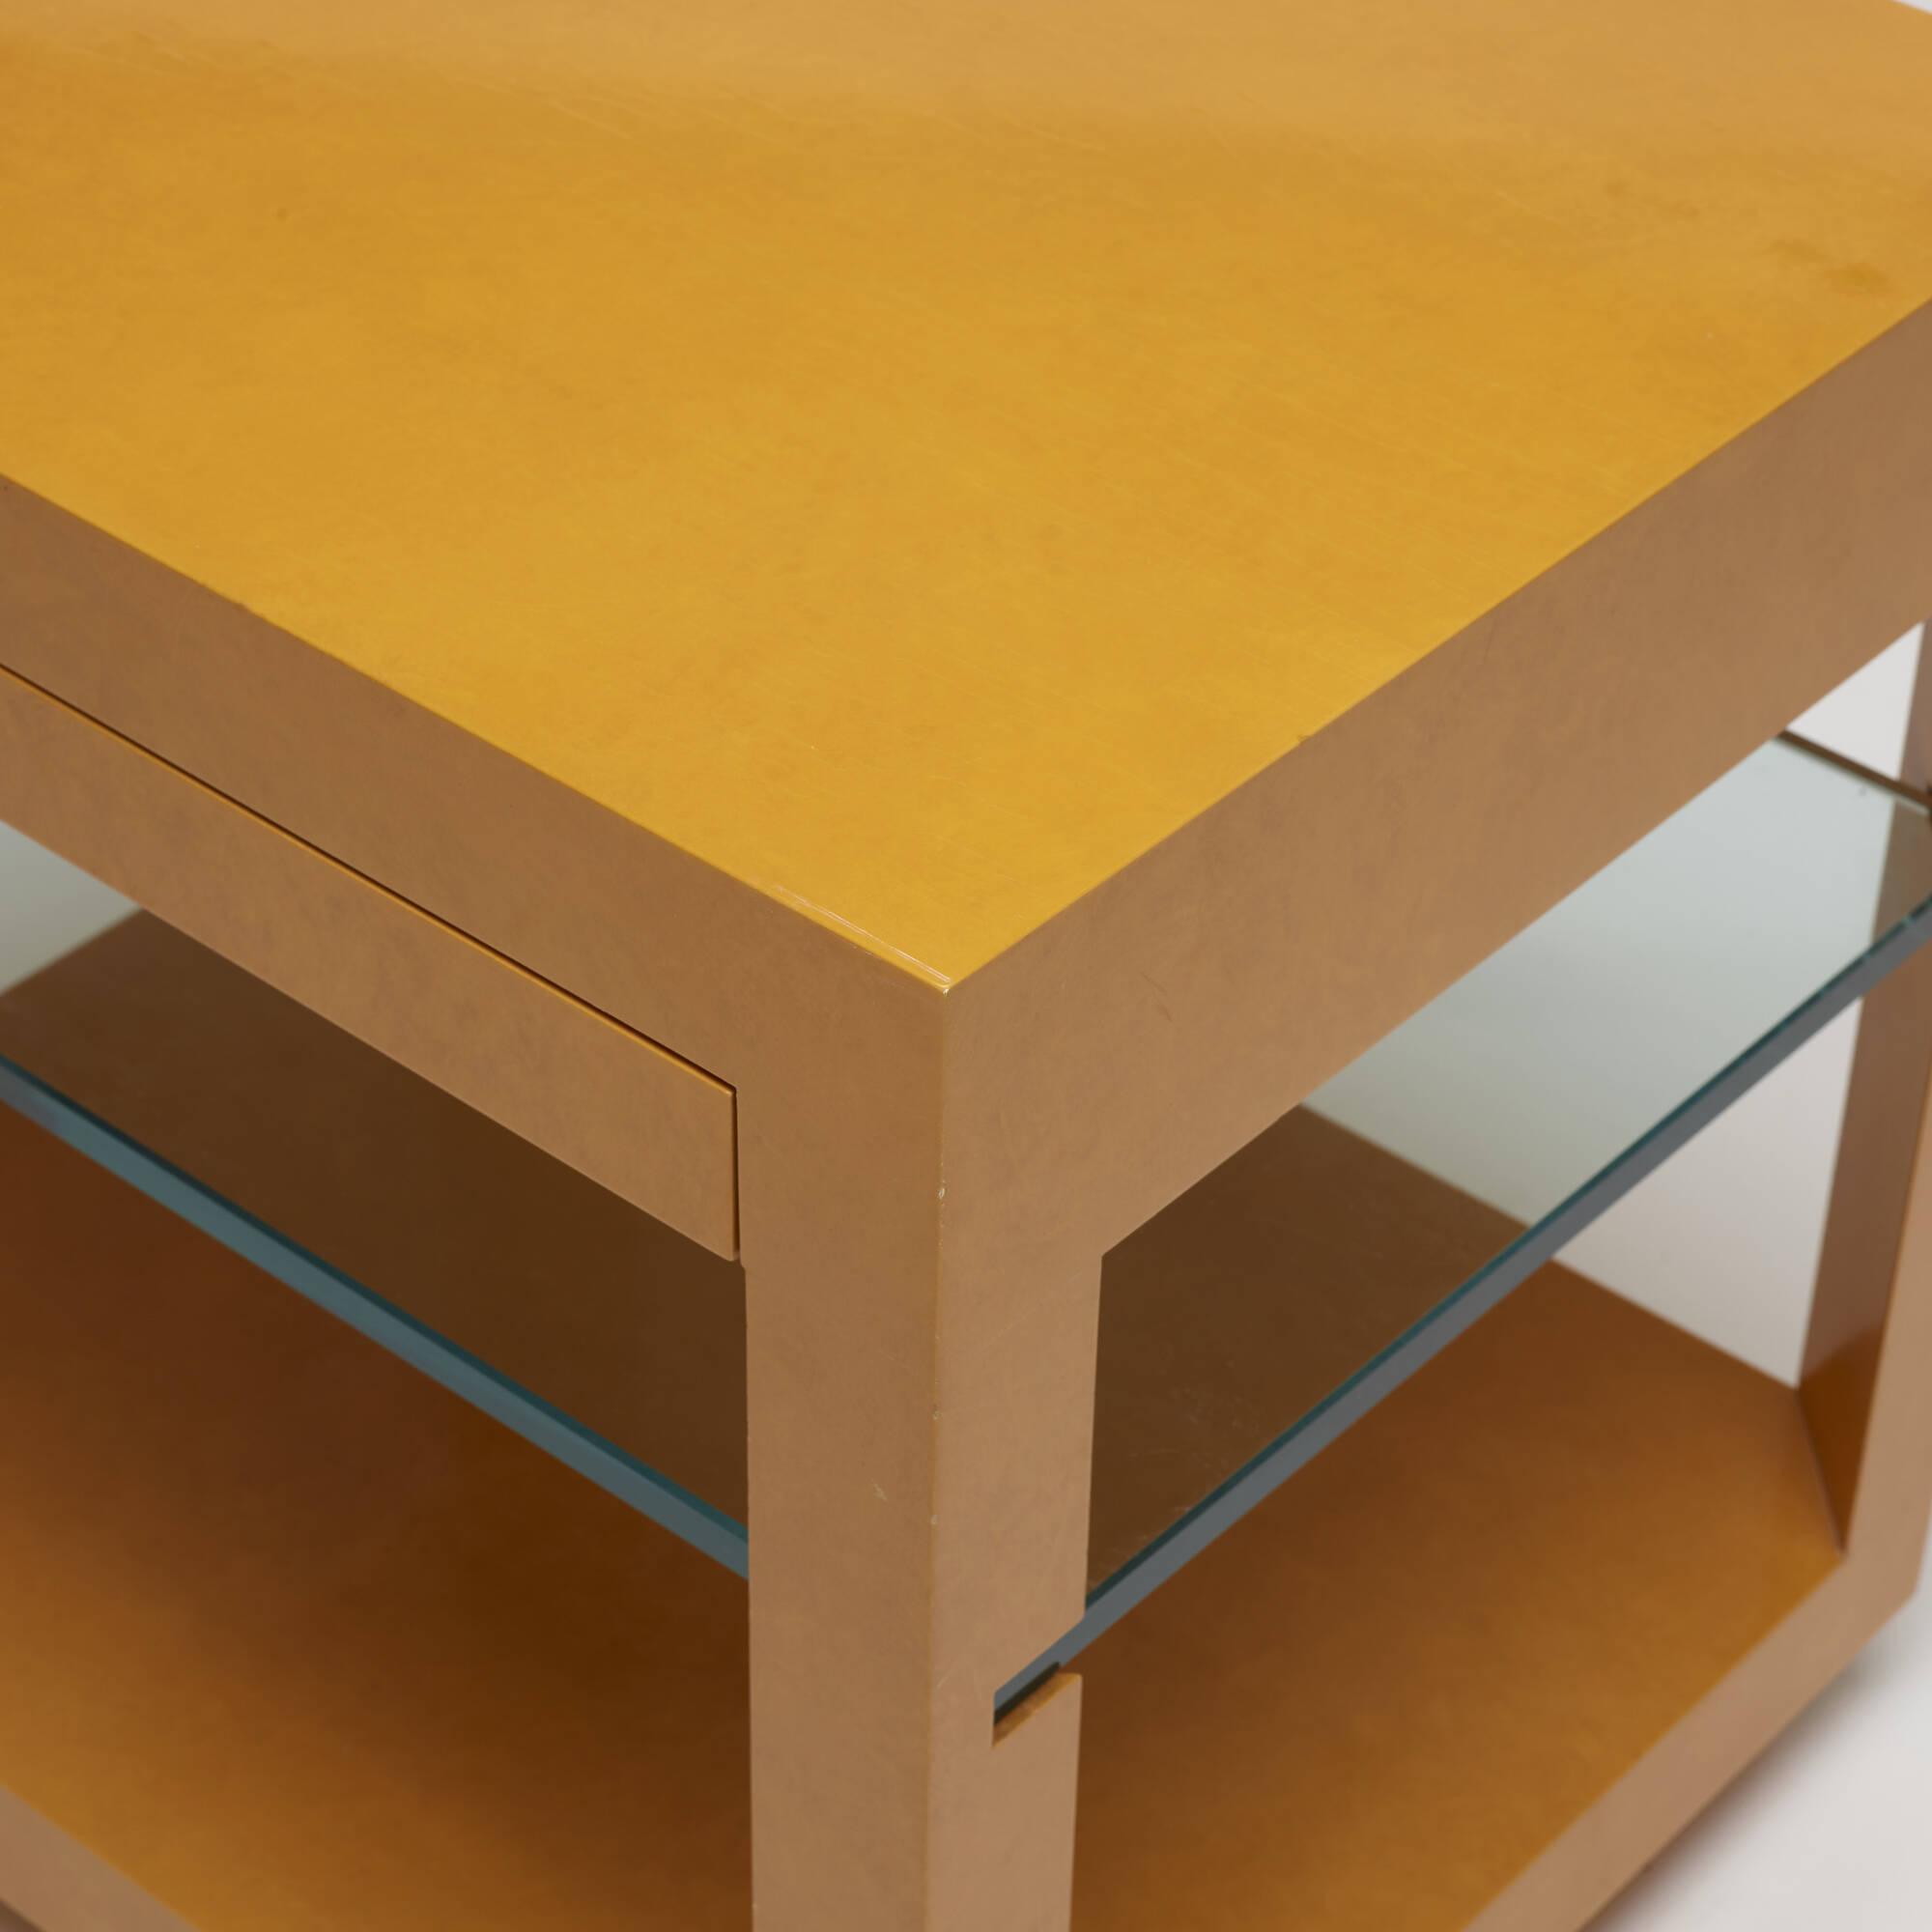 738: Karl Springer / occasional table (2 of 2)